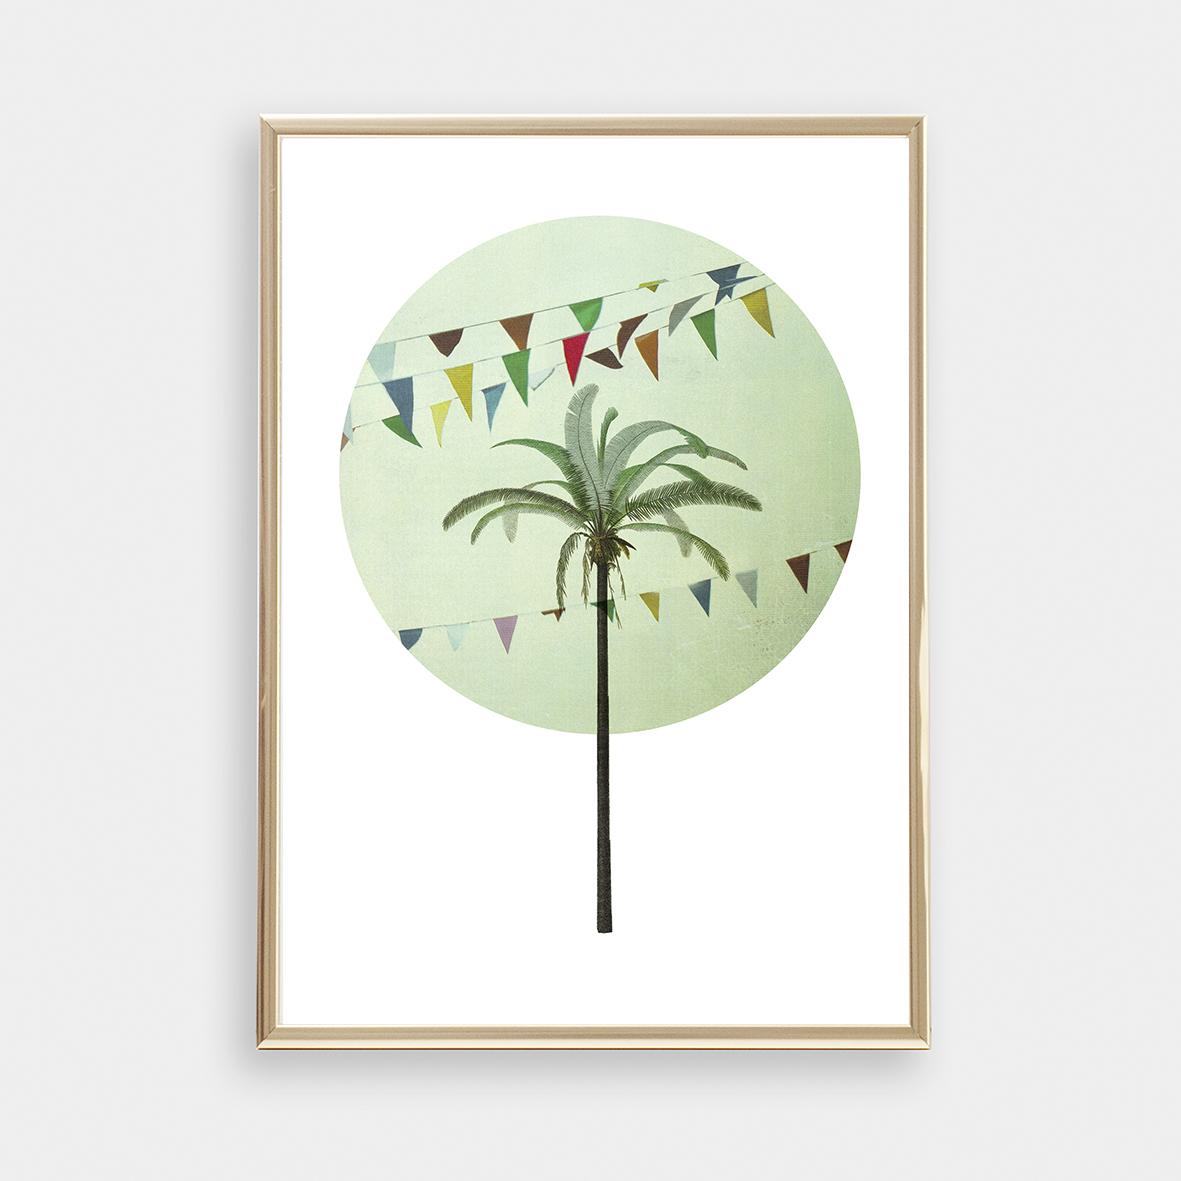 Palme Collage Poster Kunstdruck DIN A4